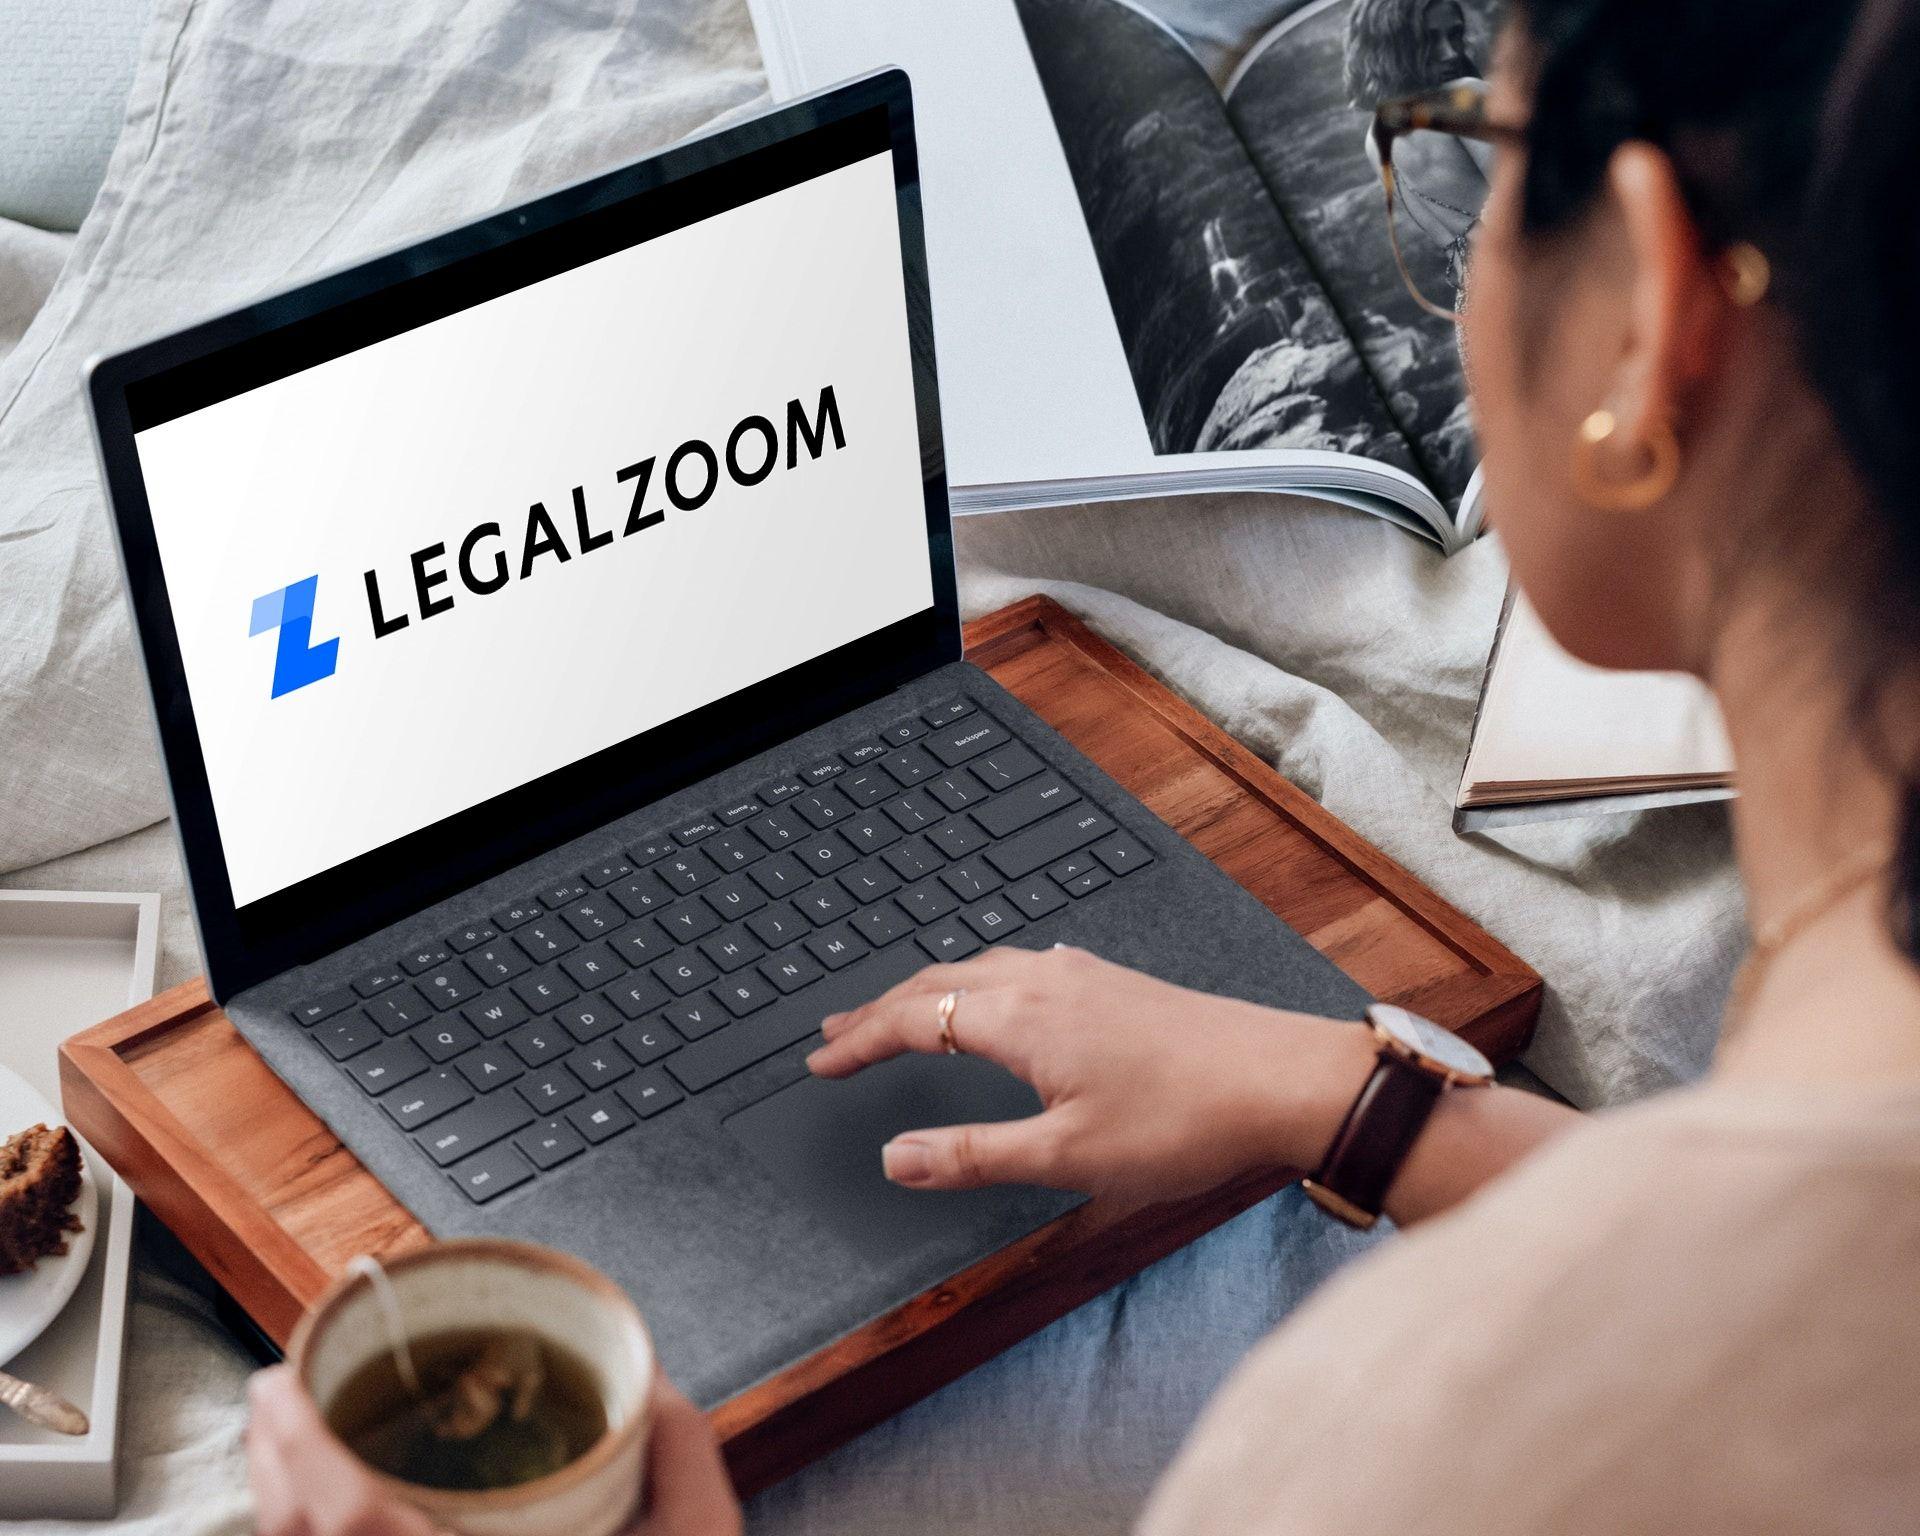 LegalZoom Initial Public Offering IPO